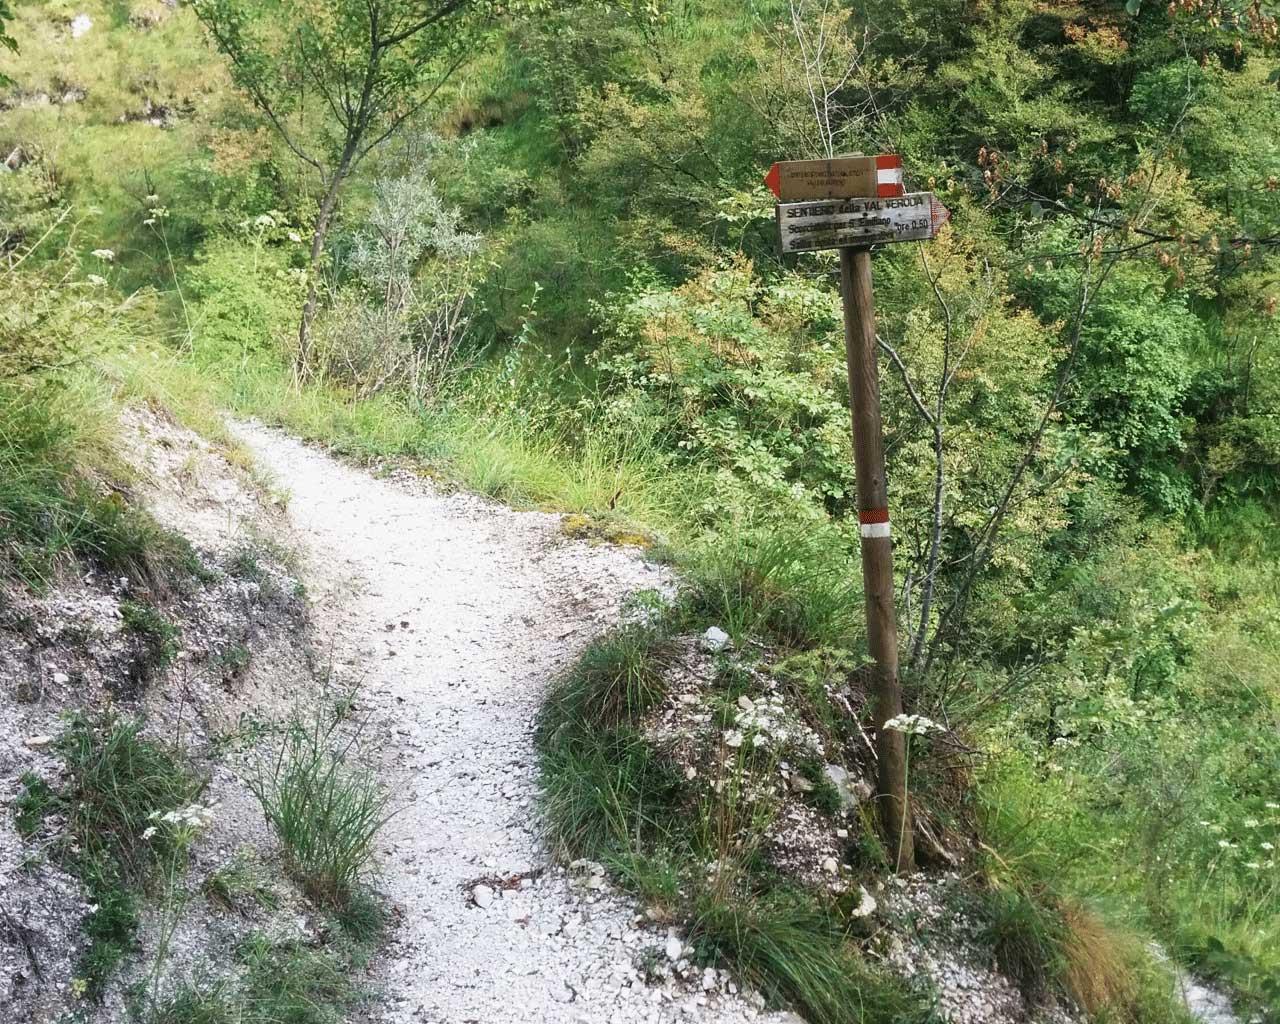 Il segnavia per la Val Veroda accanto al sentiero del Vandeno